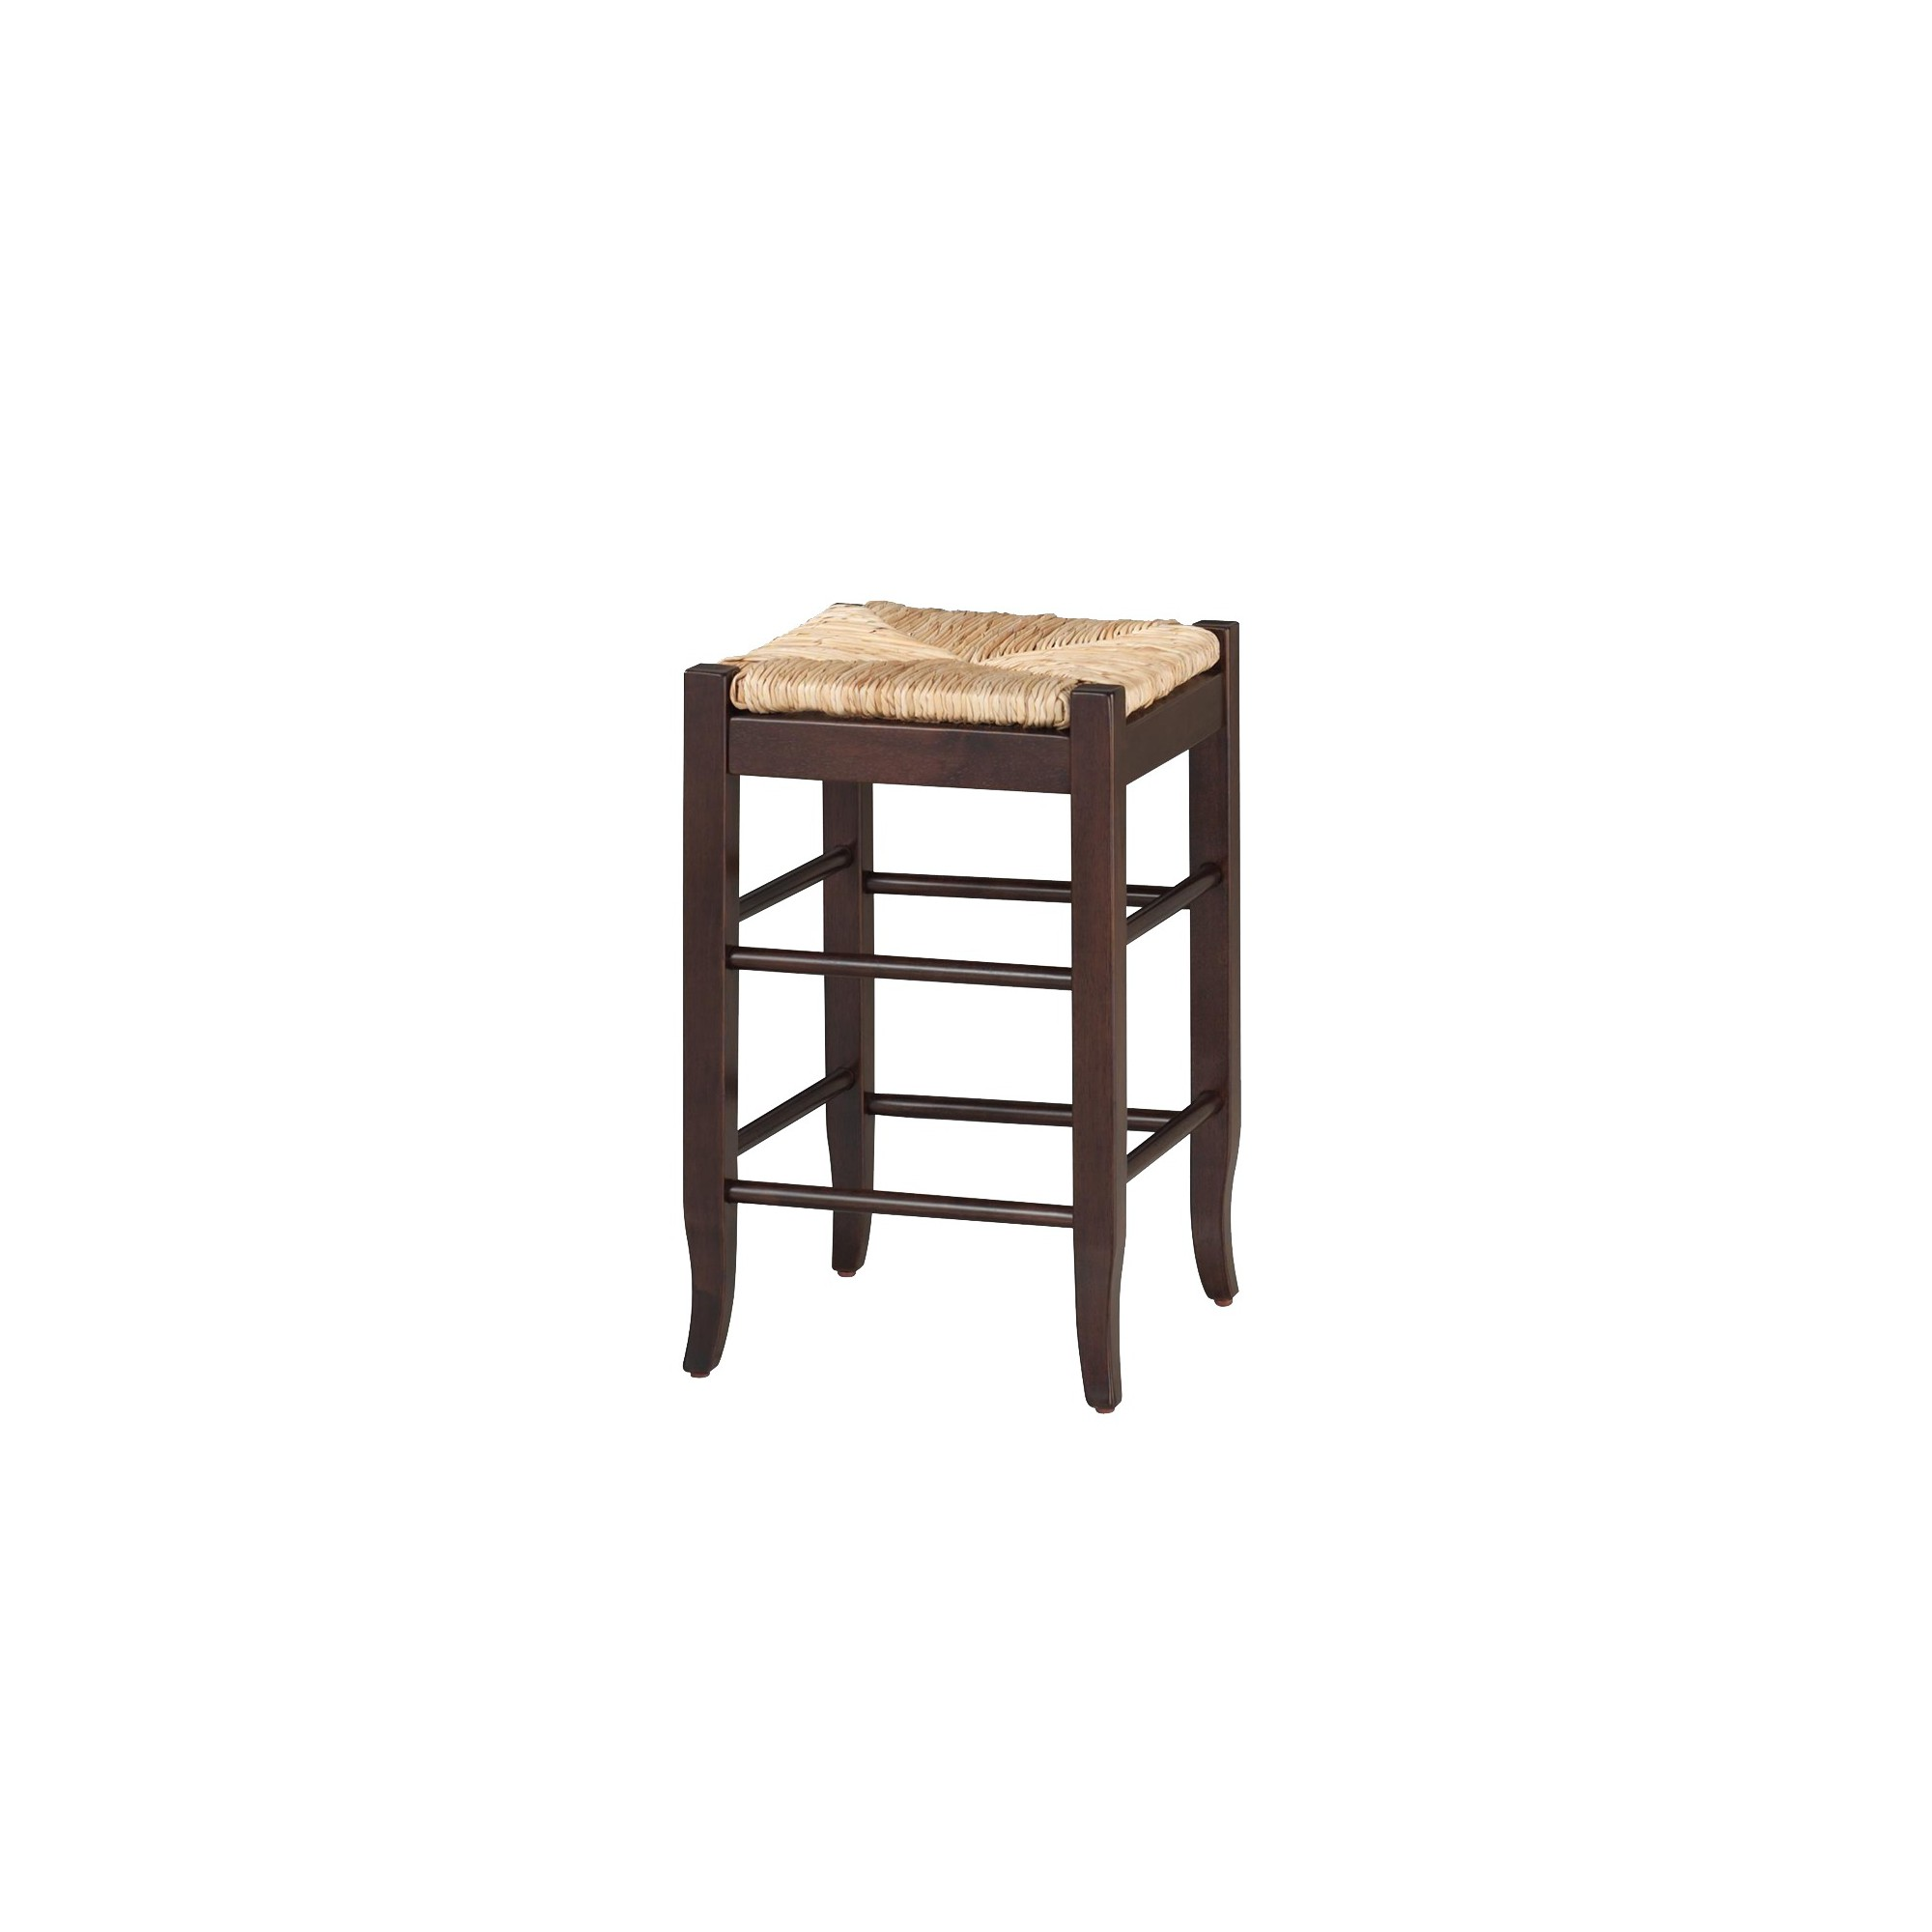 'Boraam Industries Rush Seat 24'' Counter Stool - Cappuccino, Size: 24'' Counterstool, Orange'